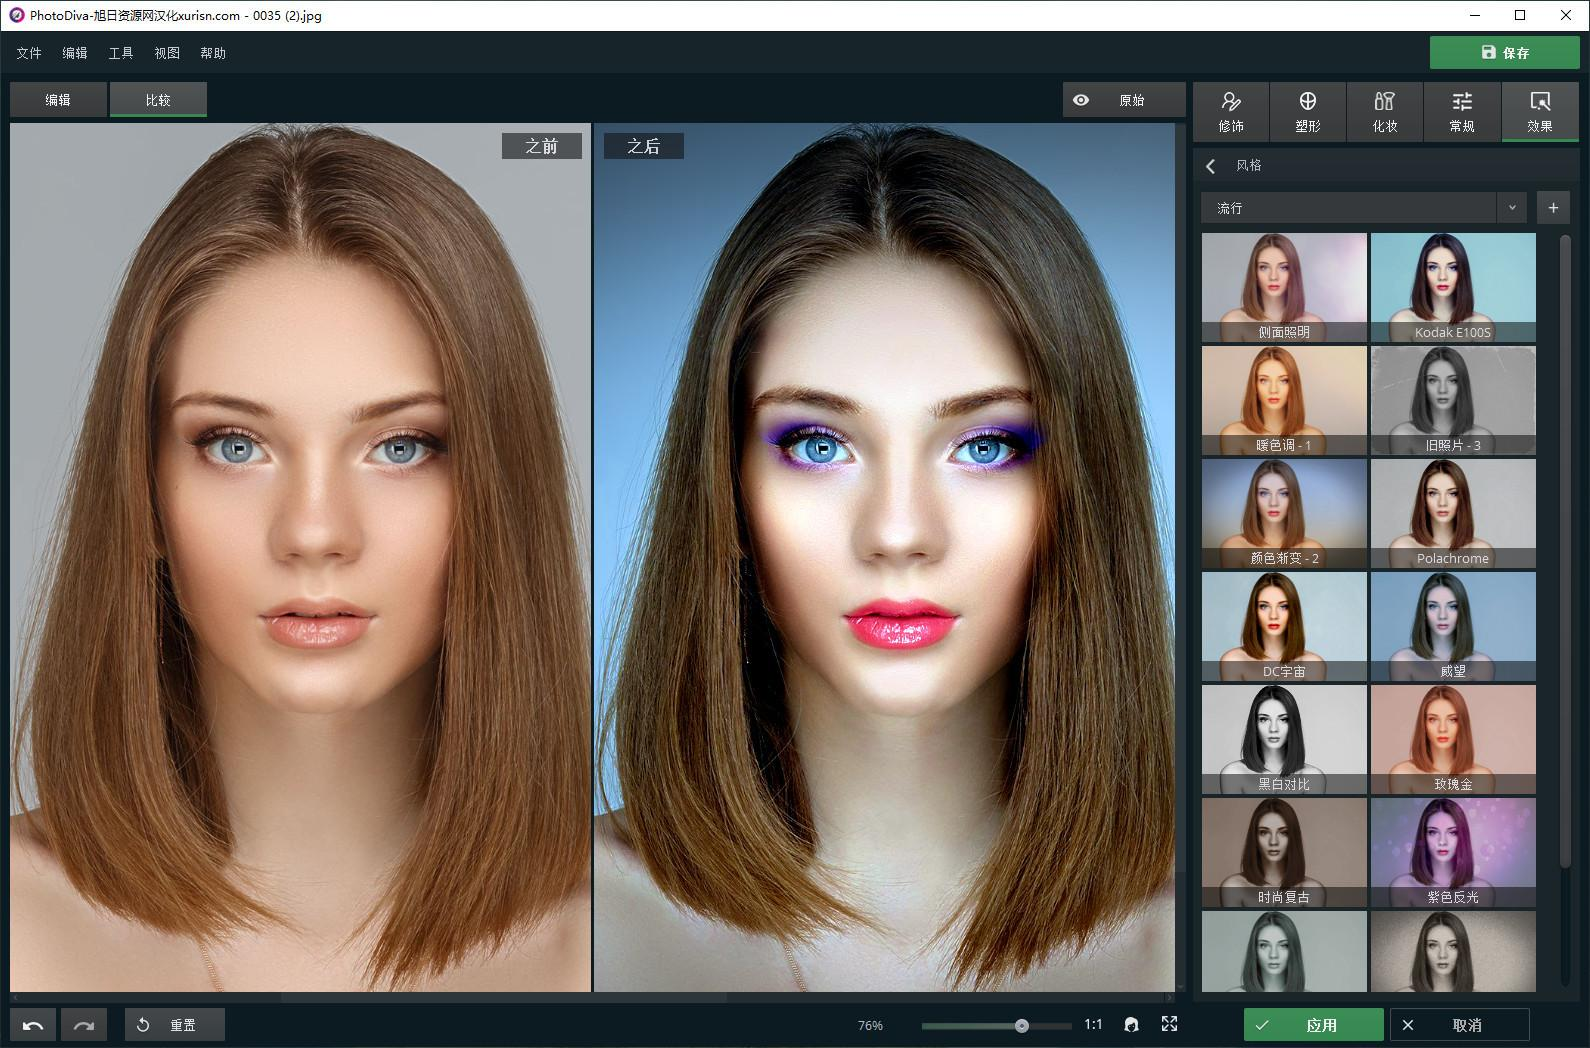 VIP资源-PhotoDiva Pro 3.0汉化版 快捷人像美容塑形修肤化妆照片编辑器(3)